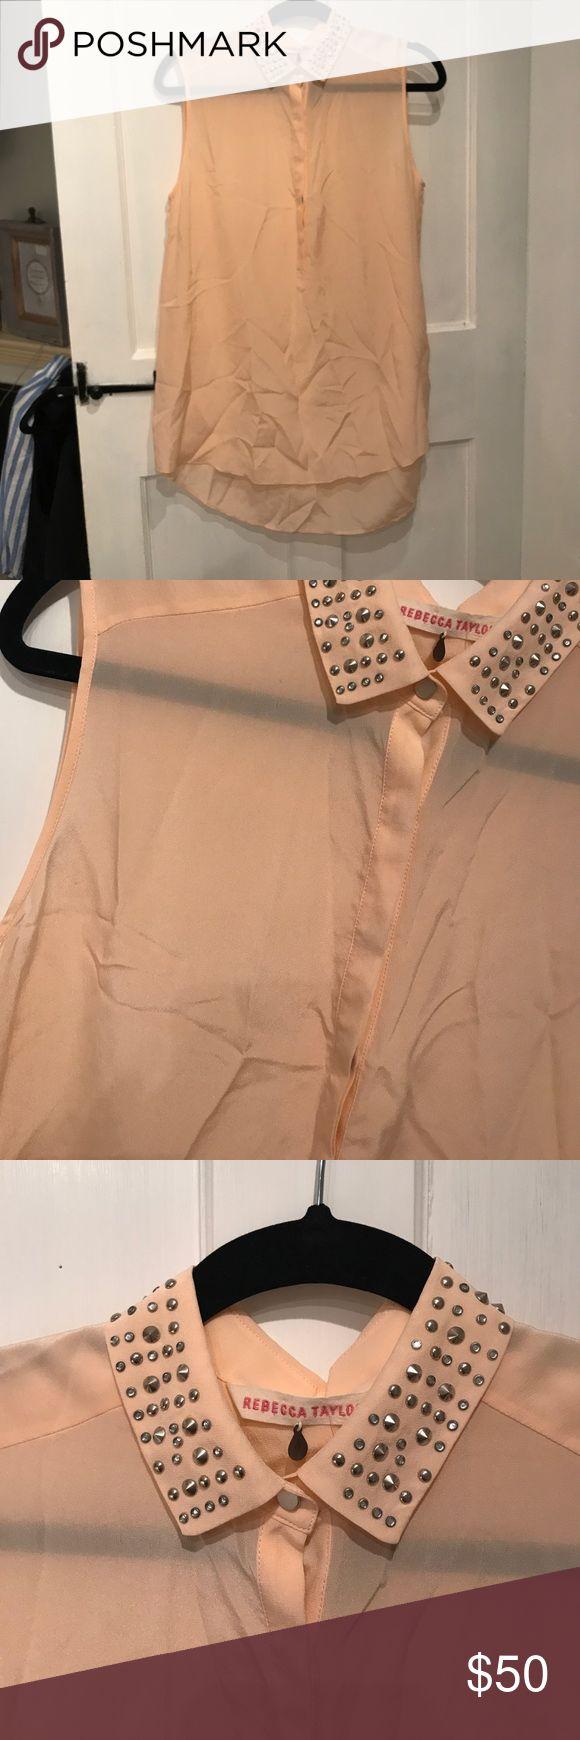 Rebecca Taylor Silk Blouse Orange And Pink 65